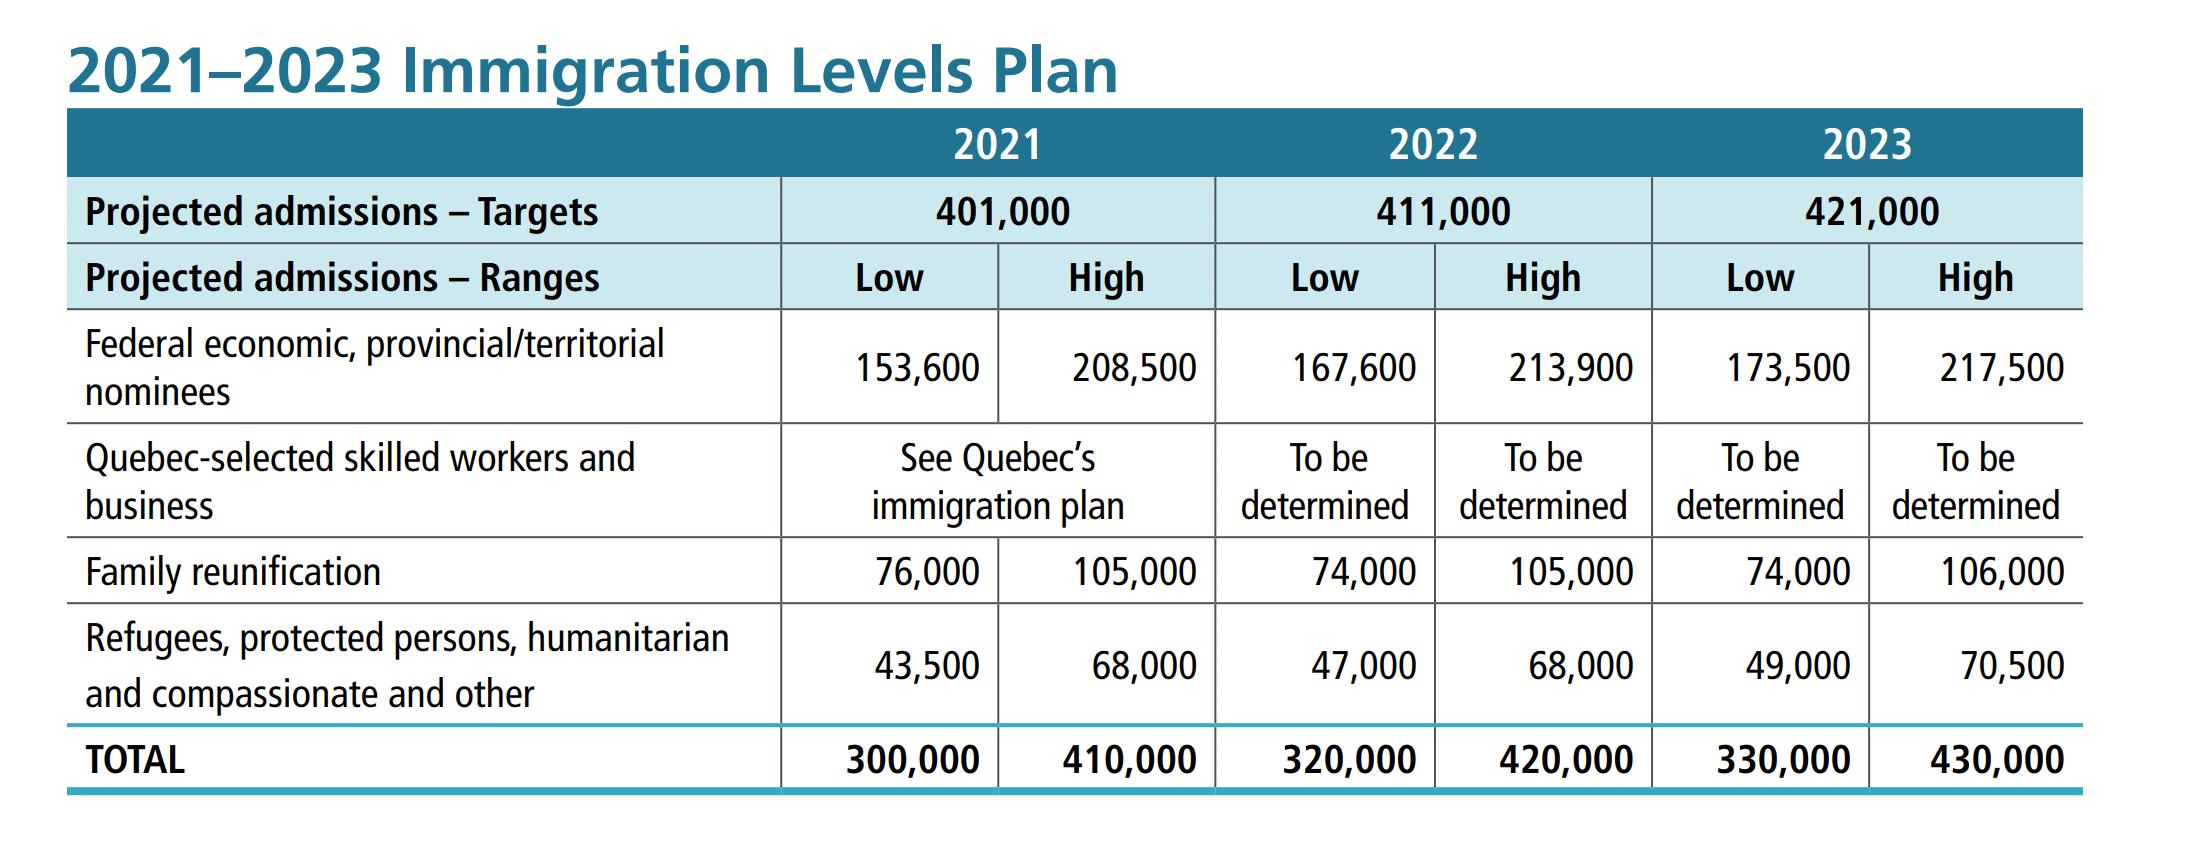 Immigration plan 2021-2023 summary